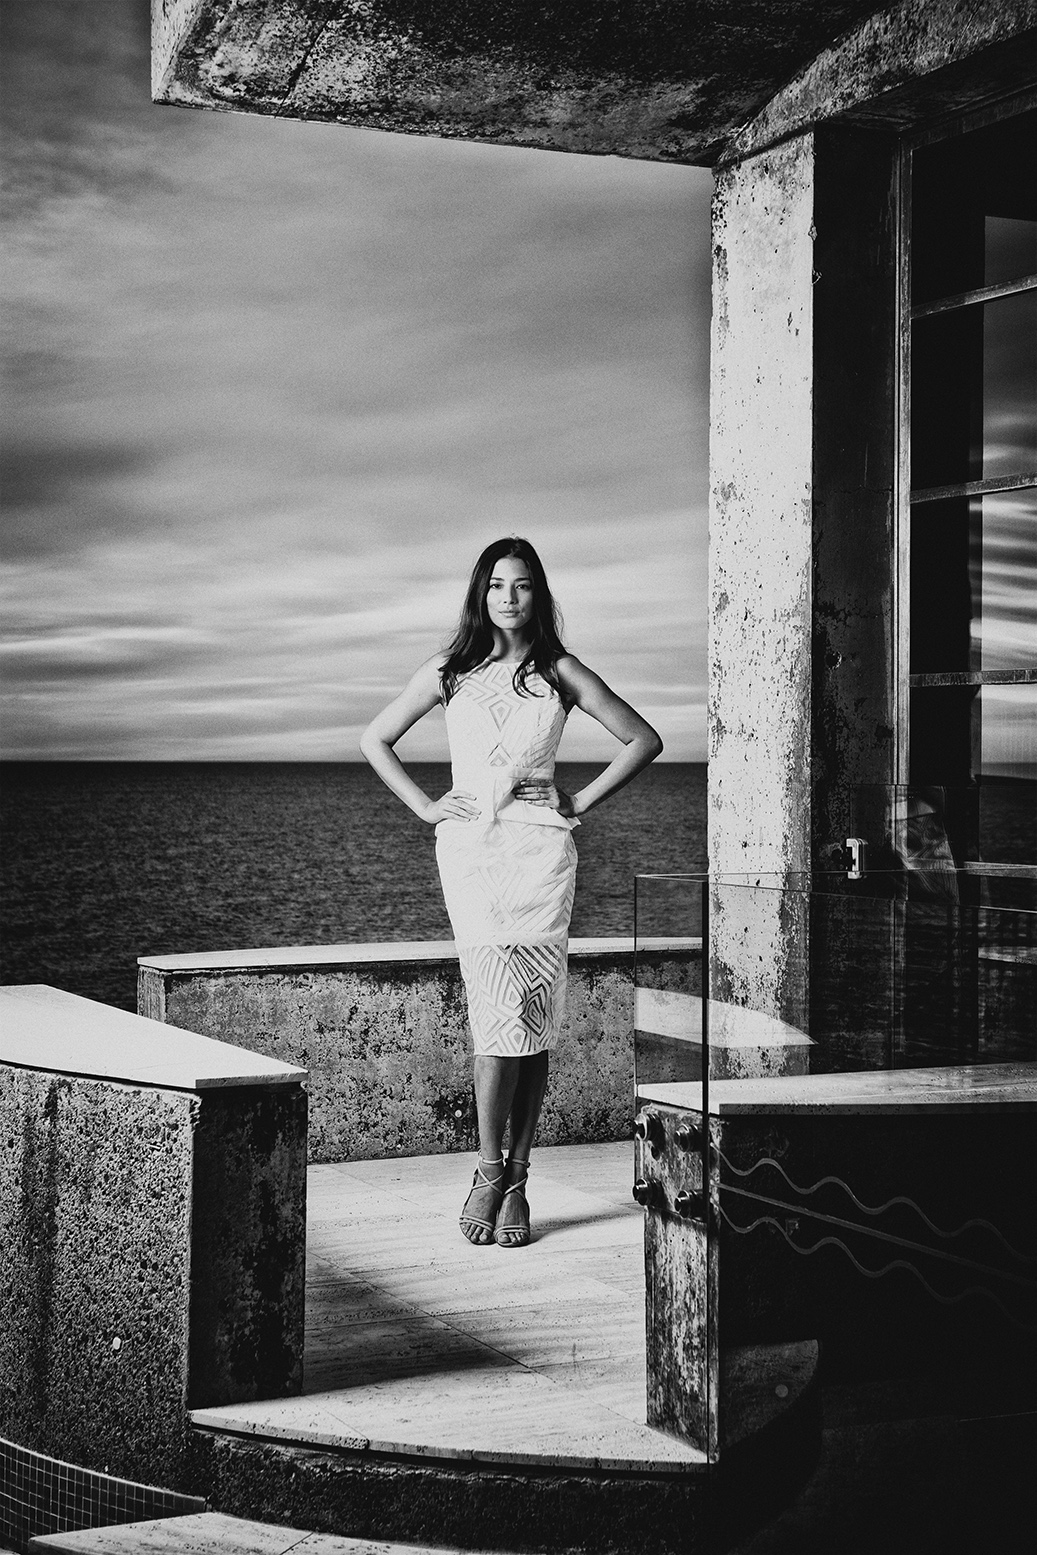 Jessica Gomes for Brisbane News Magazine.   Hair by Aveda, Make-Up by Shu Uemura, Styling : Kimberly Gardner   photography : Russell Shakespeare